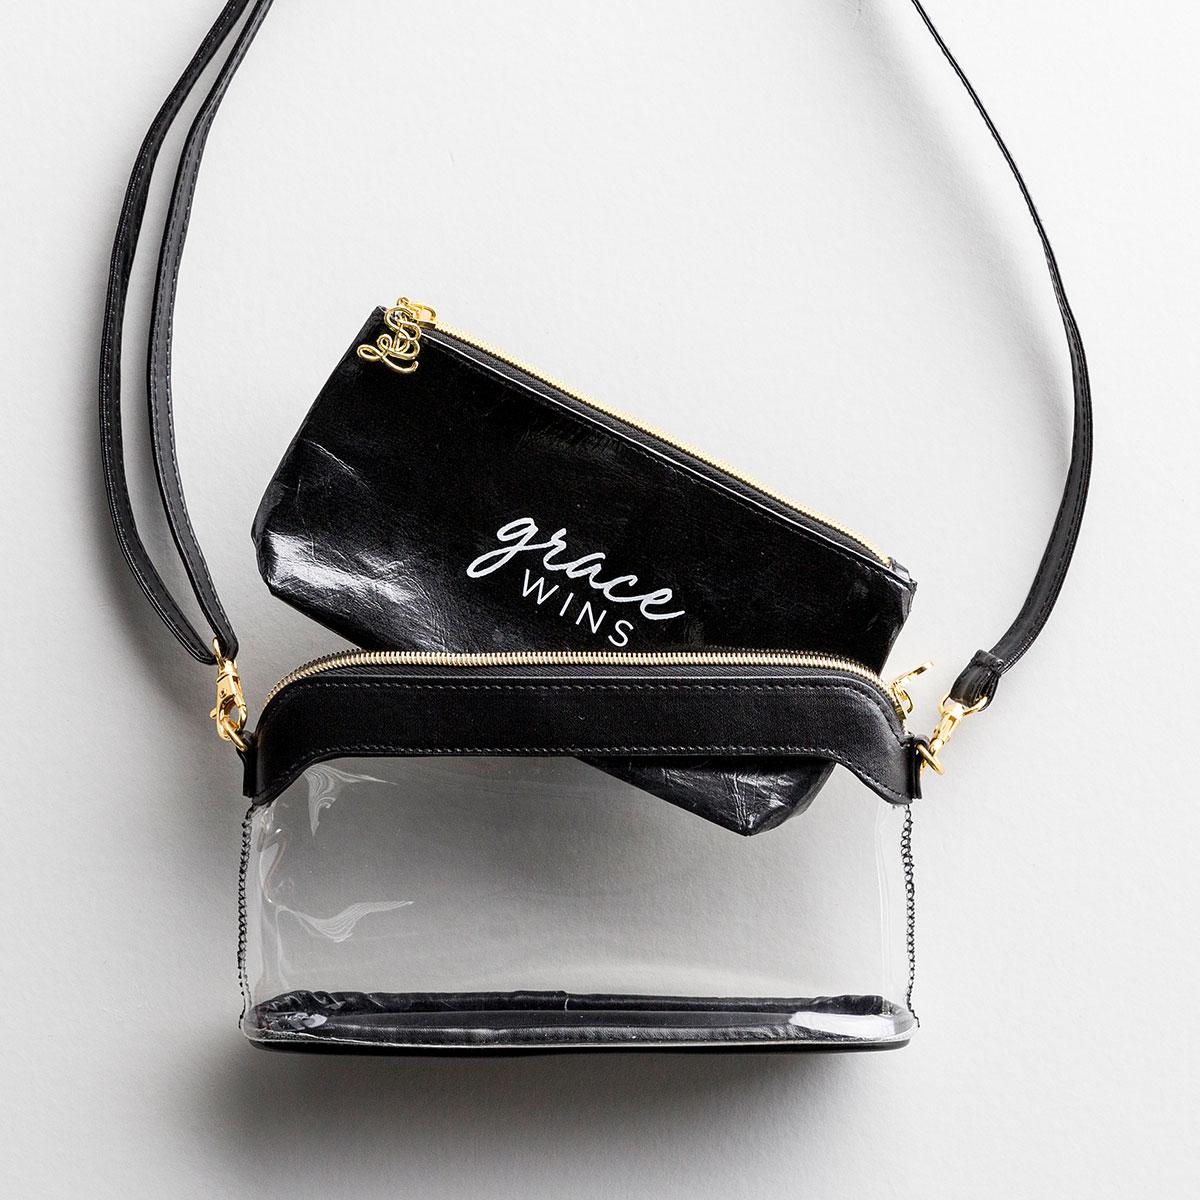 Grace Wins - Black - Clear Stadium Bag & Stadium Bag Insert Gift Set